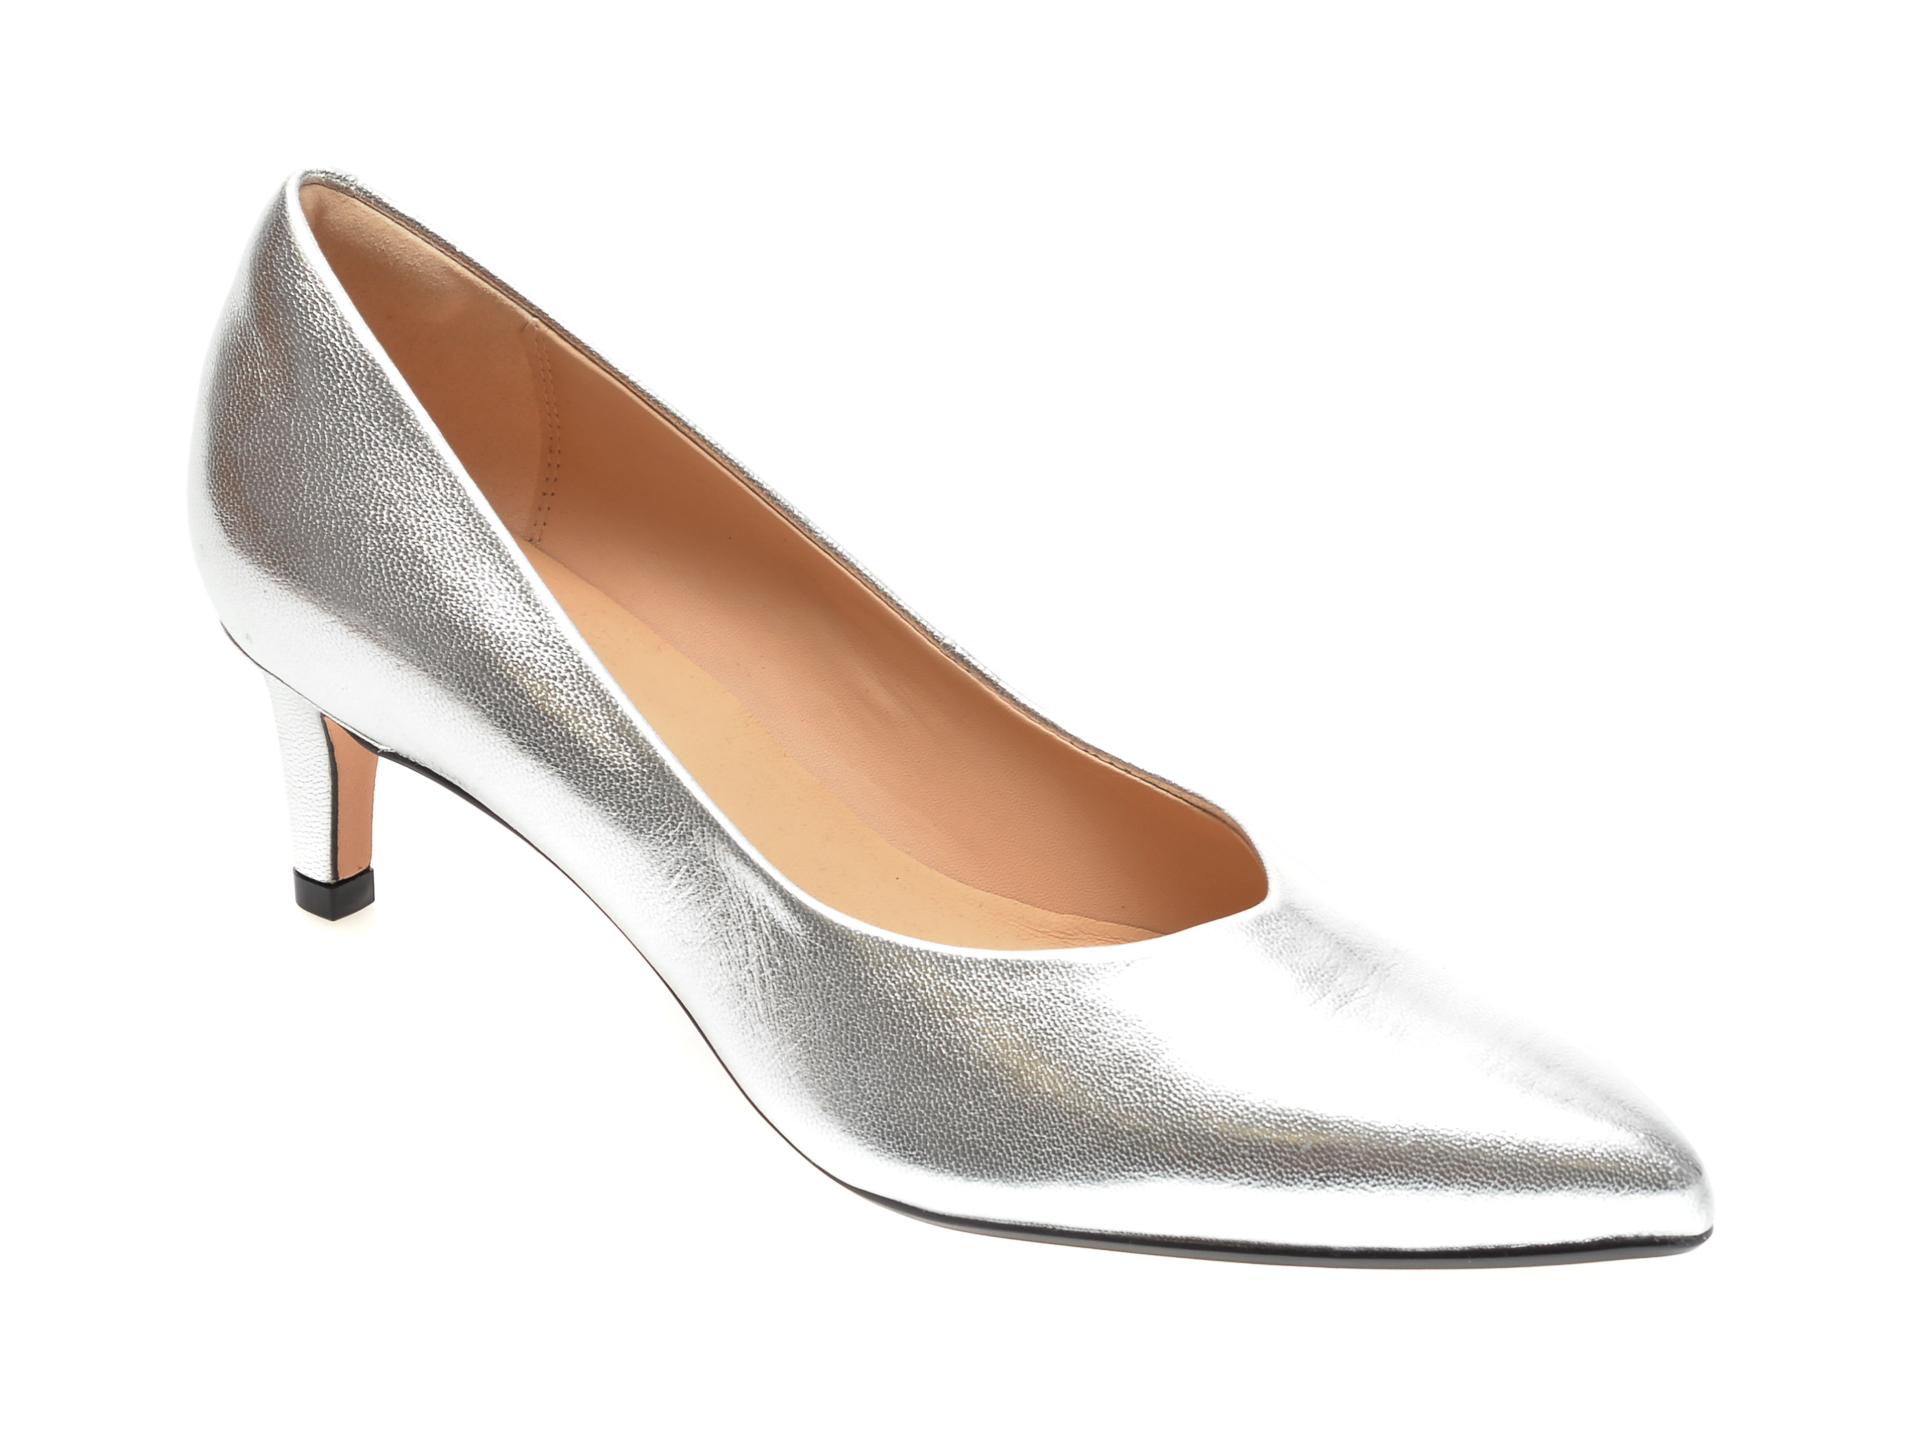 Pantofi CLARKS argintii, LAI55C2, din piele naturala lacuita imagine